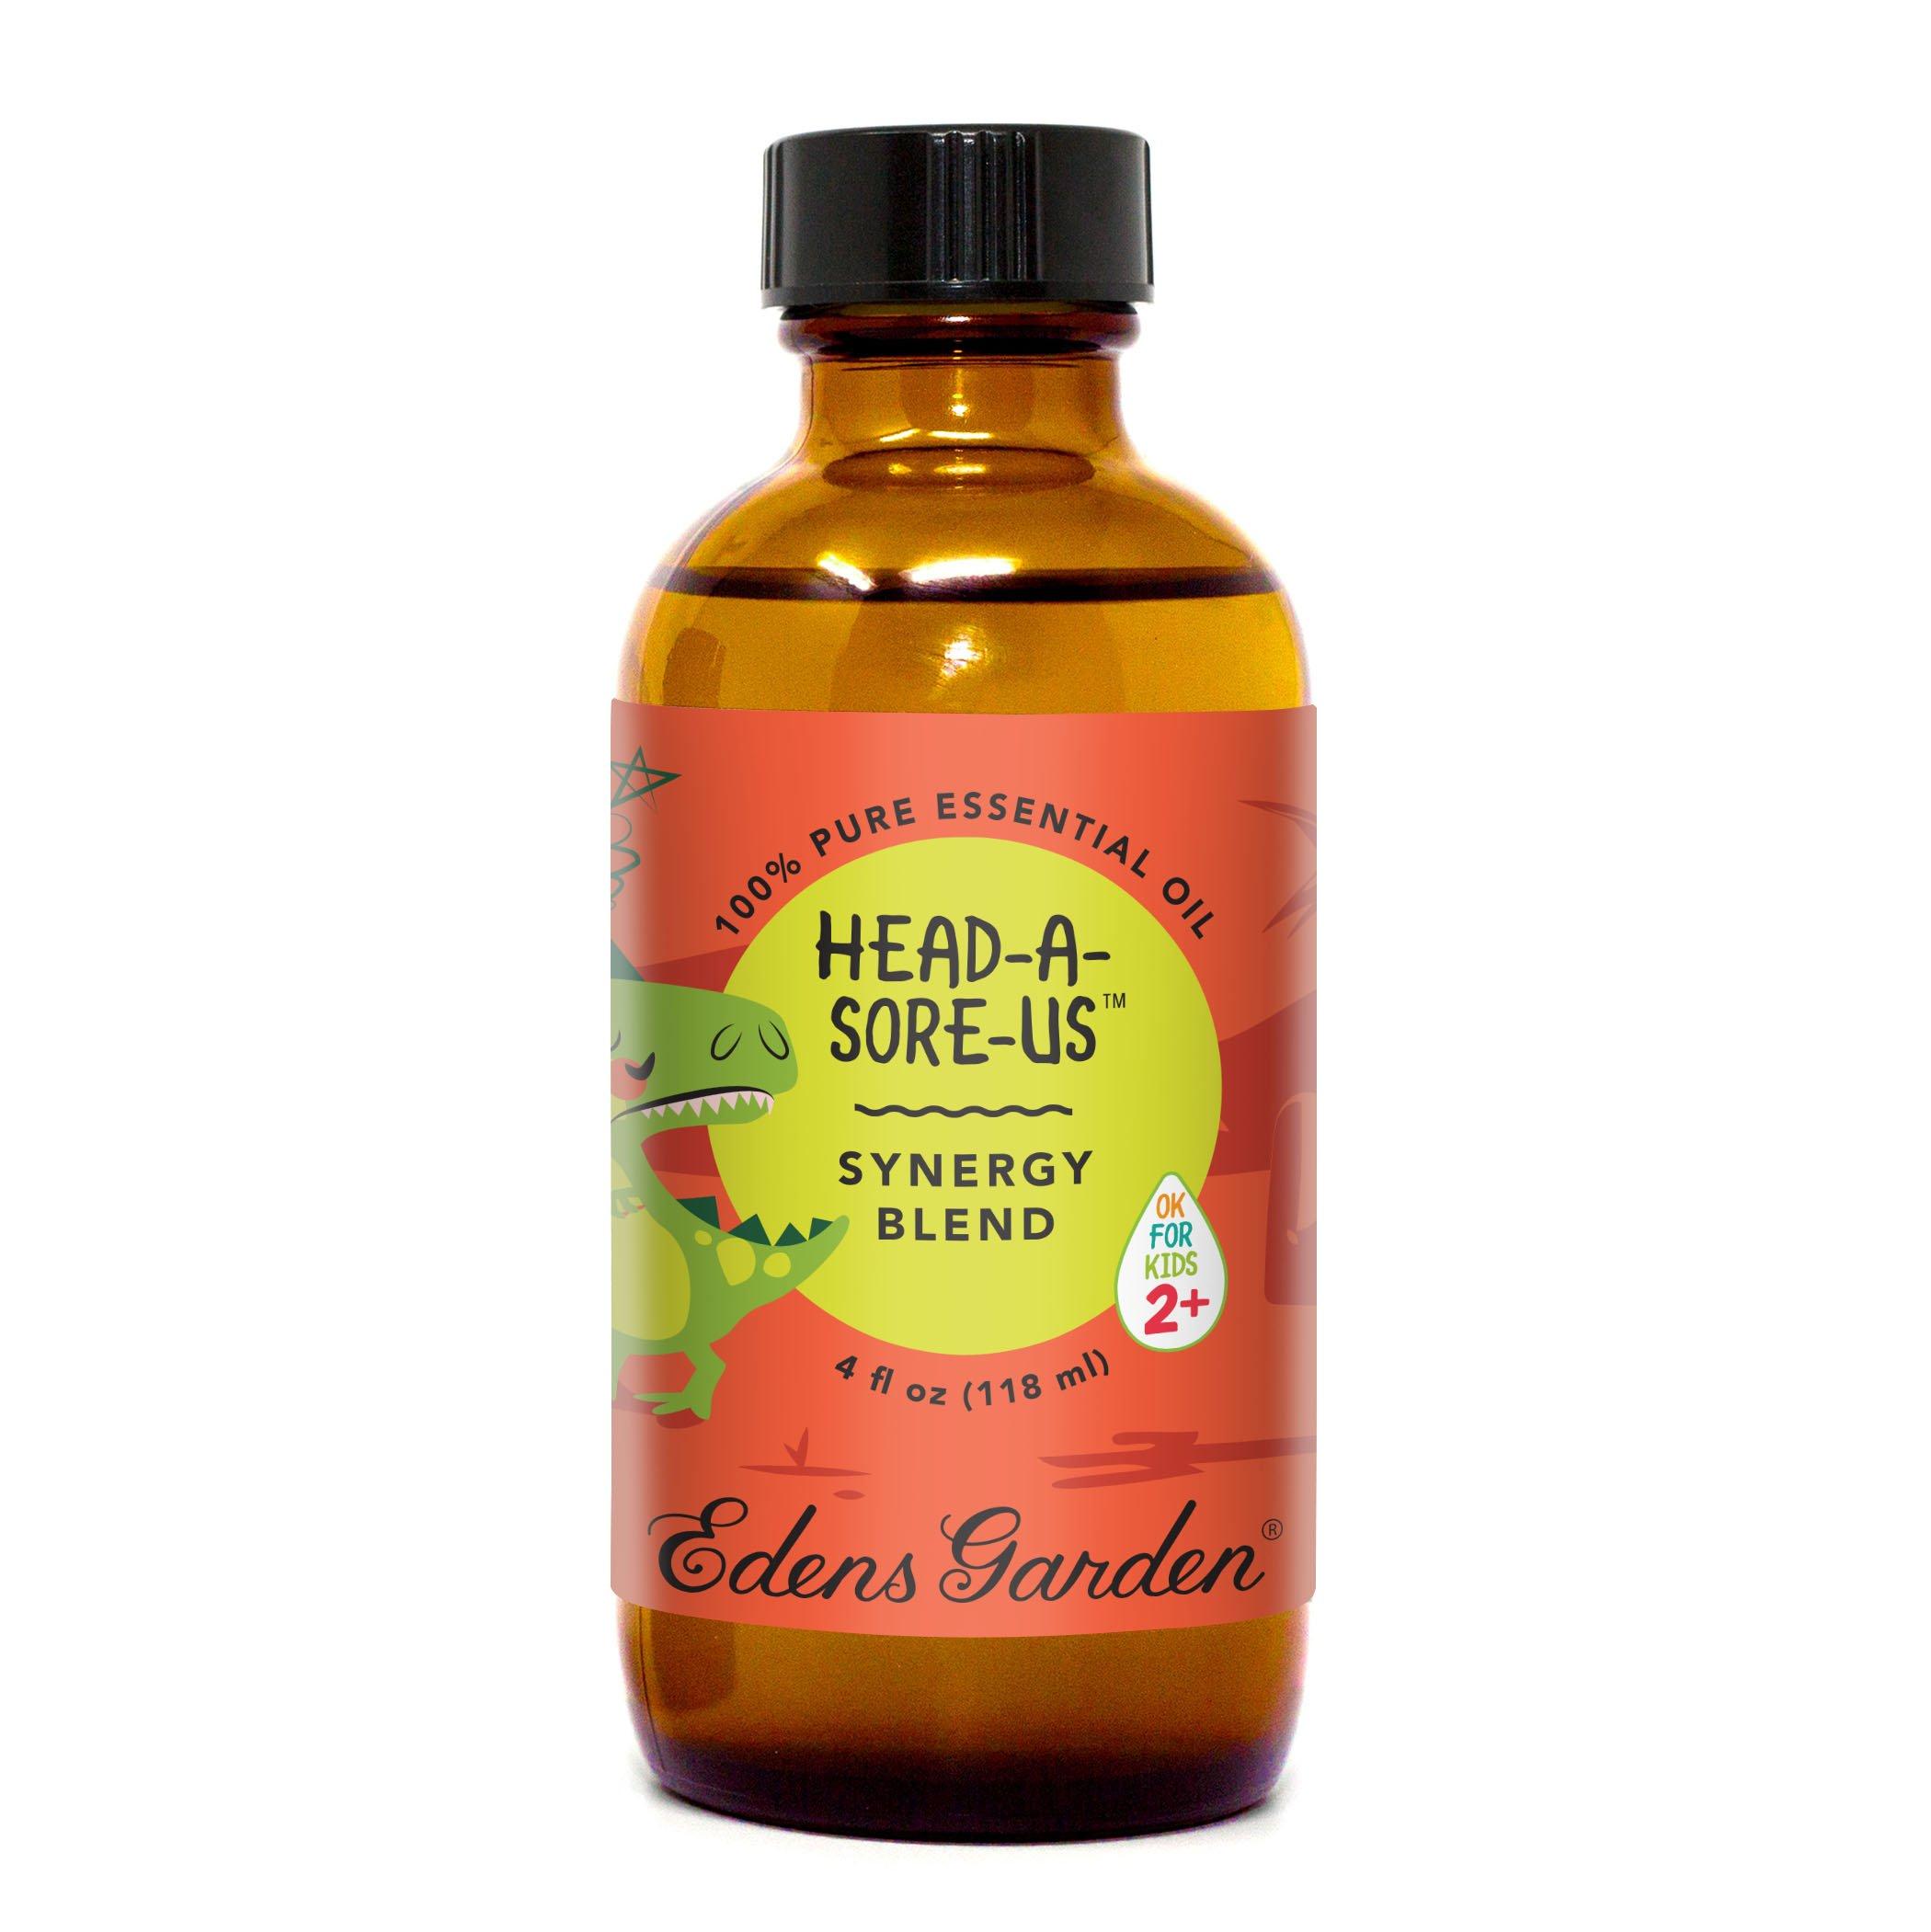 Edens Garden Head-A-Sore-Us''OK For Kids'' Essential Oil Synergy Blend, 100% Pure Therapeutic Grade (Child Safe 2+, Headache & Sleep), 118 ml